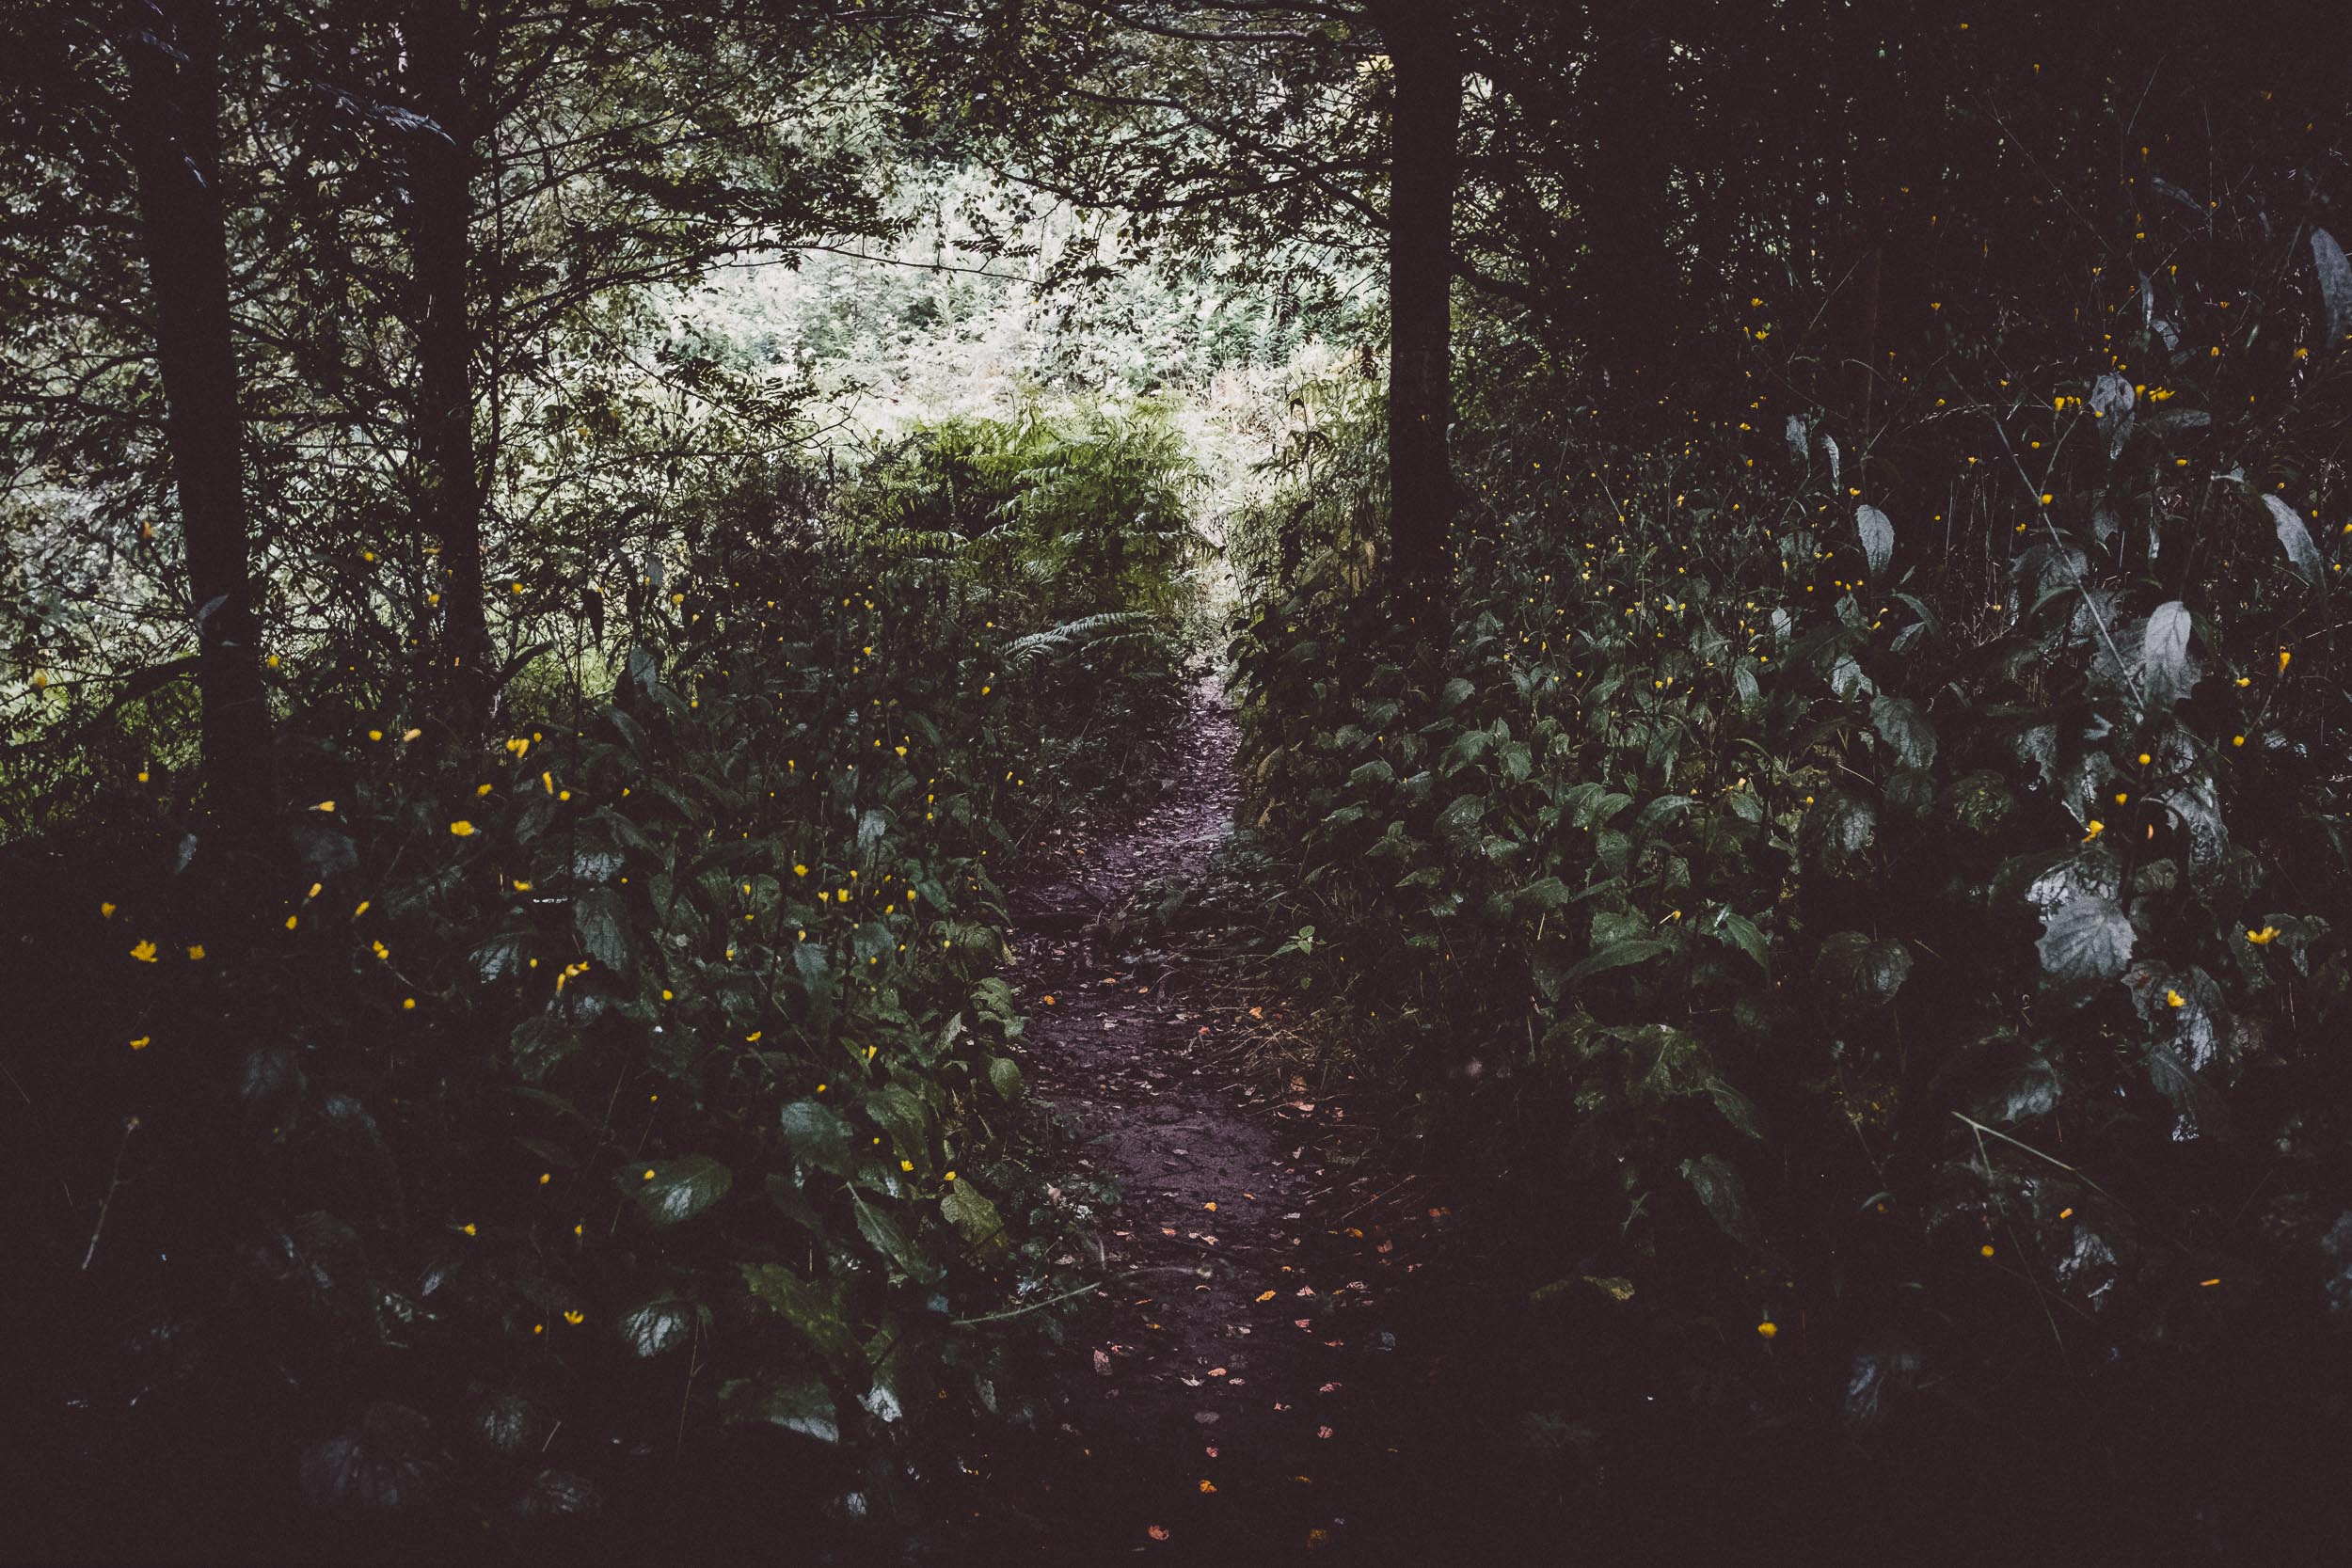 Through the Marsh Marigold